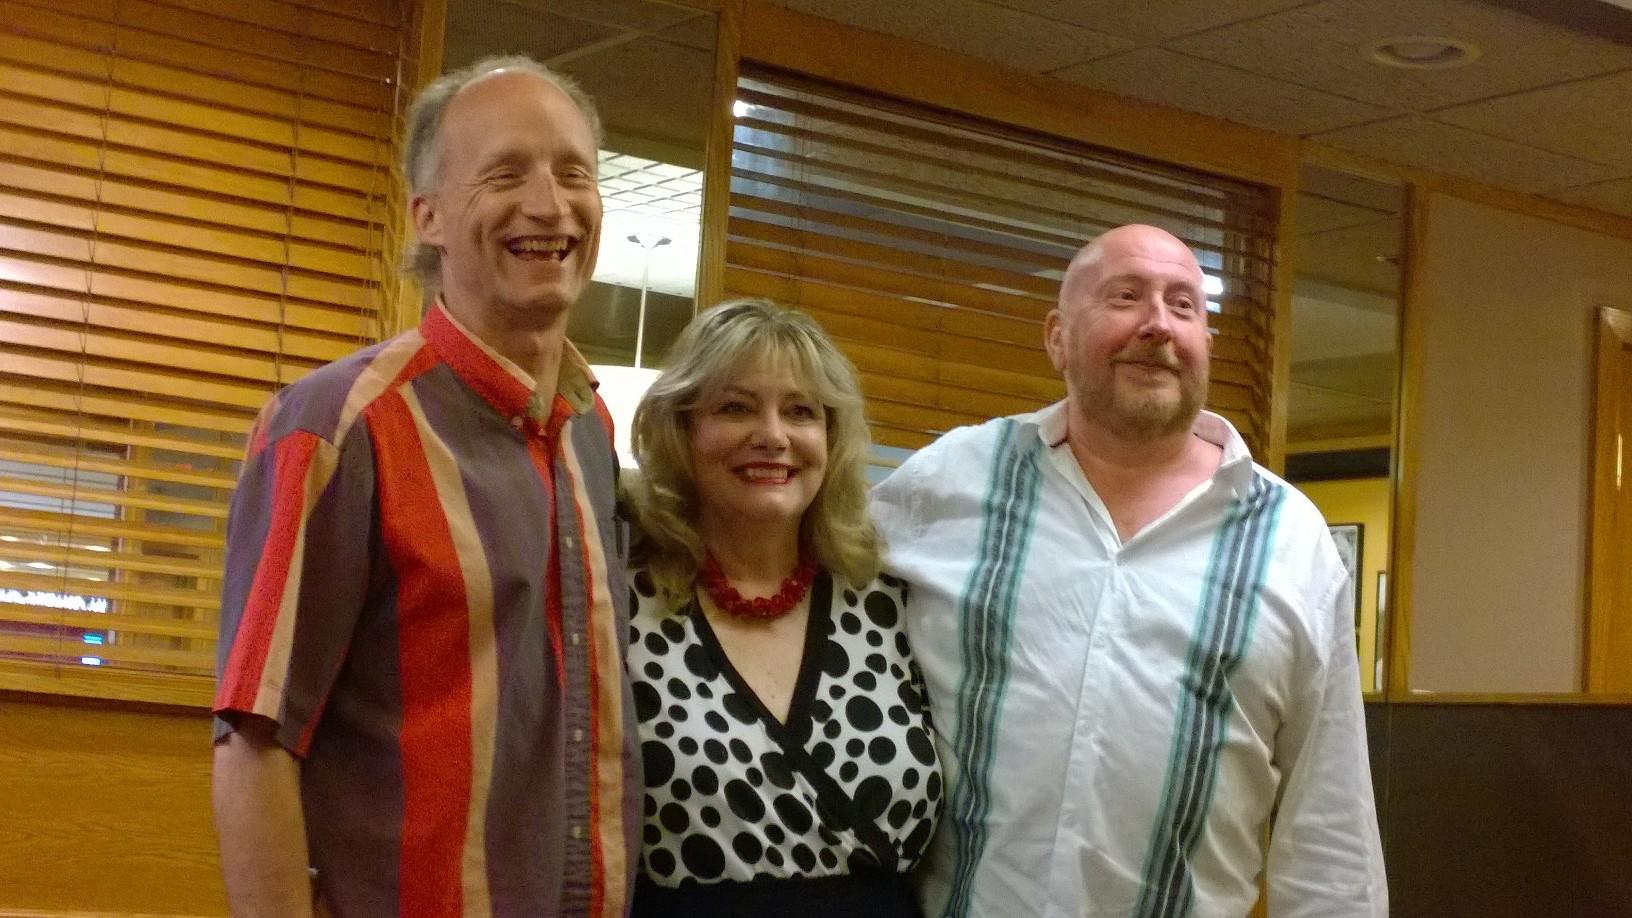 Richard O., Cynthia W. and Bill R. as The Three Headed Expert.